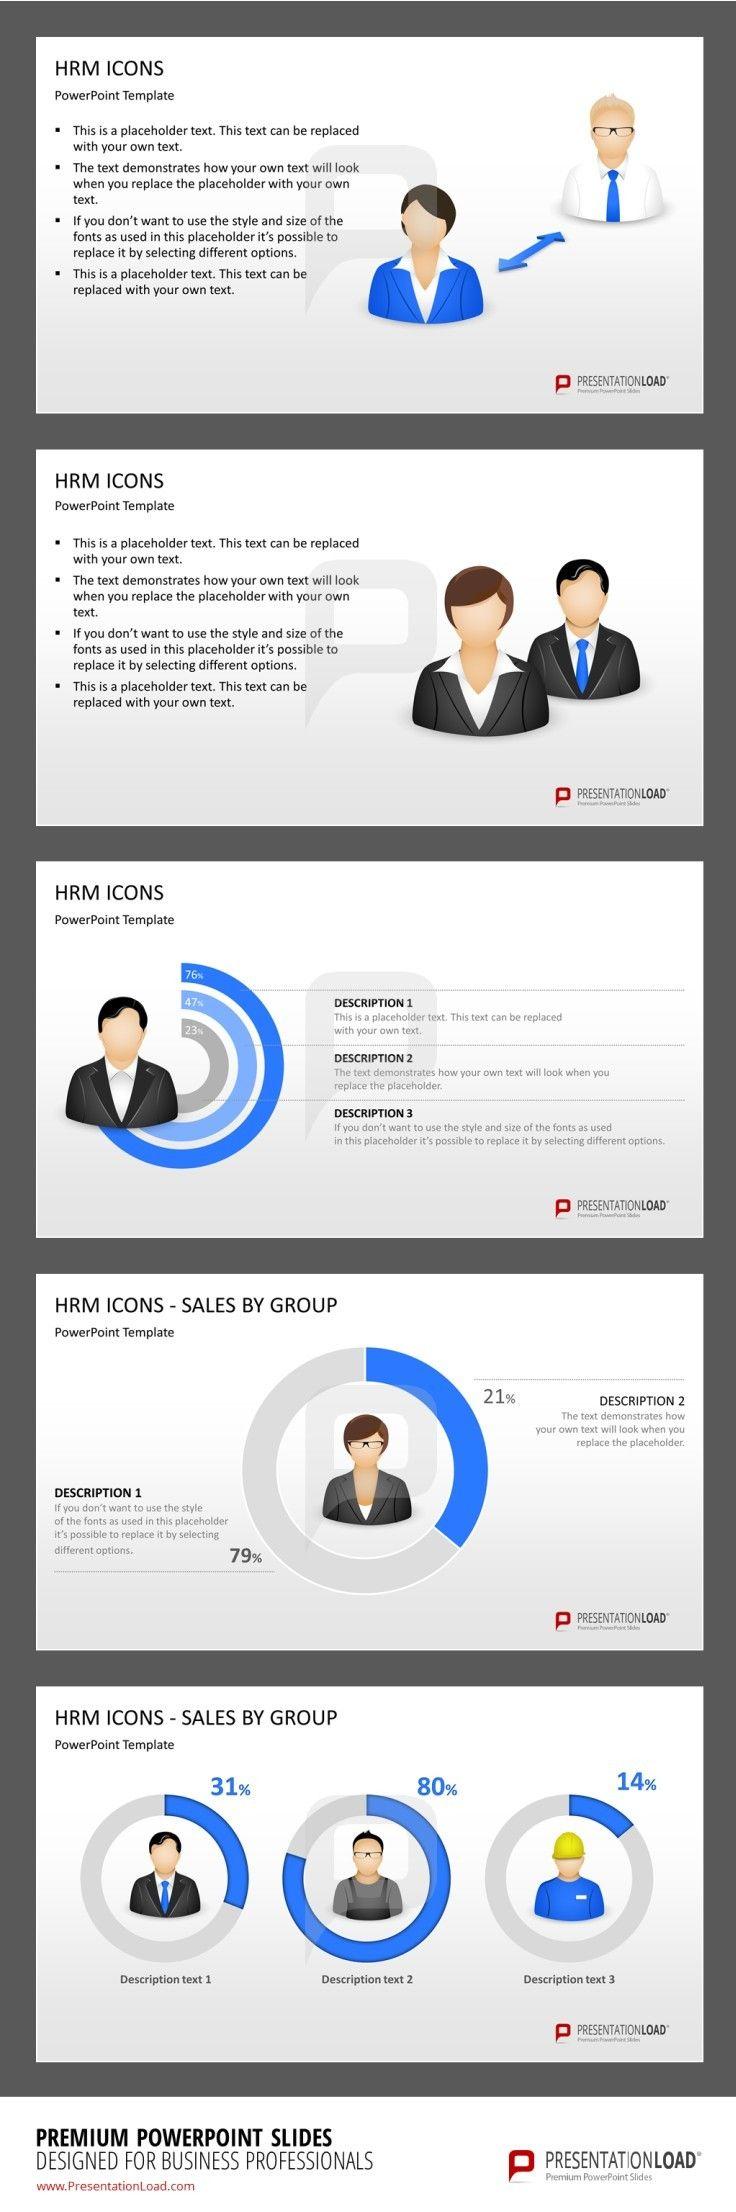 Human Resource Management PowerPoint Template  #presentationload http://www.presentationload.com/human-resource-management-hrm-models-powerpoint-template.html